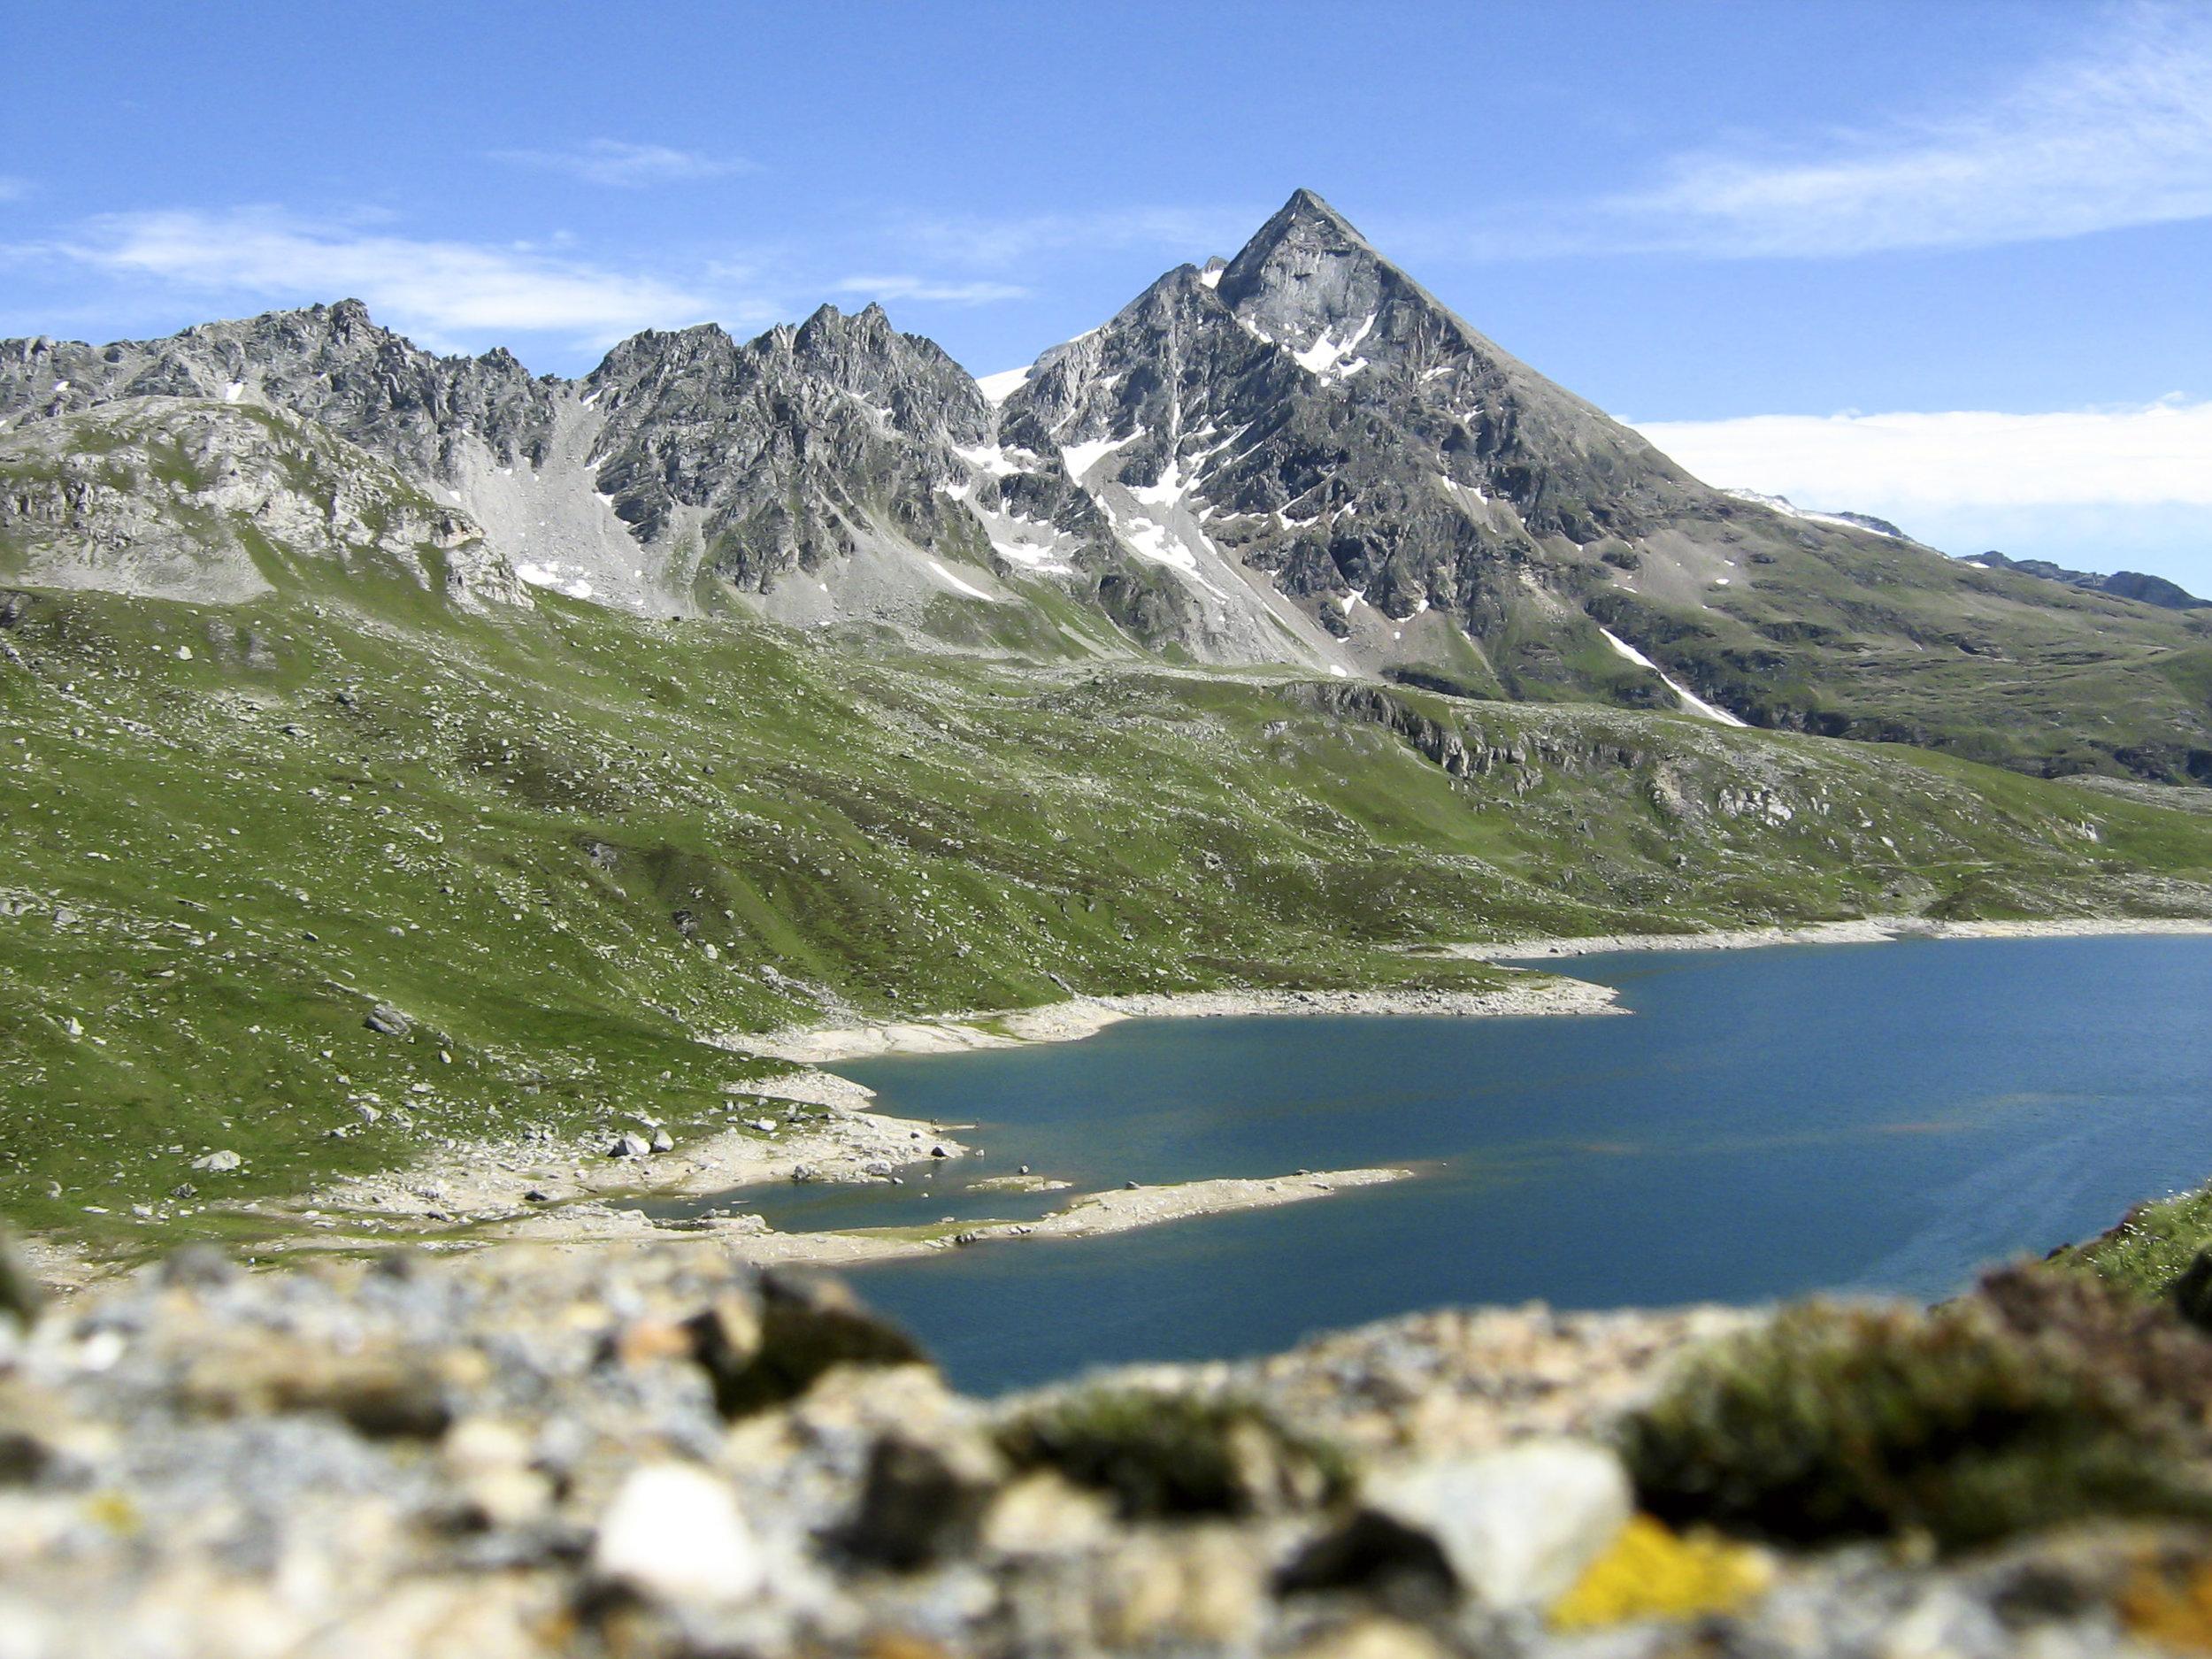 San Giacomo pass